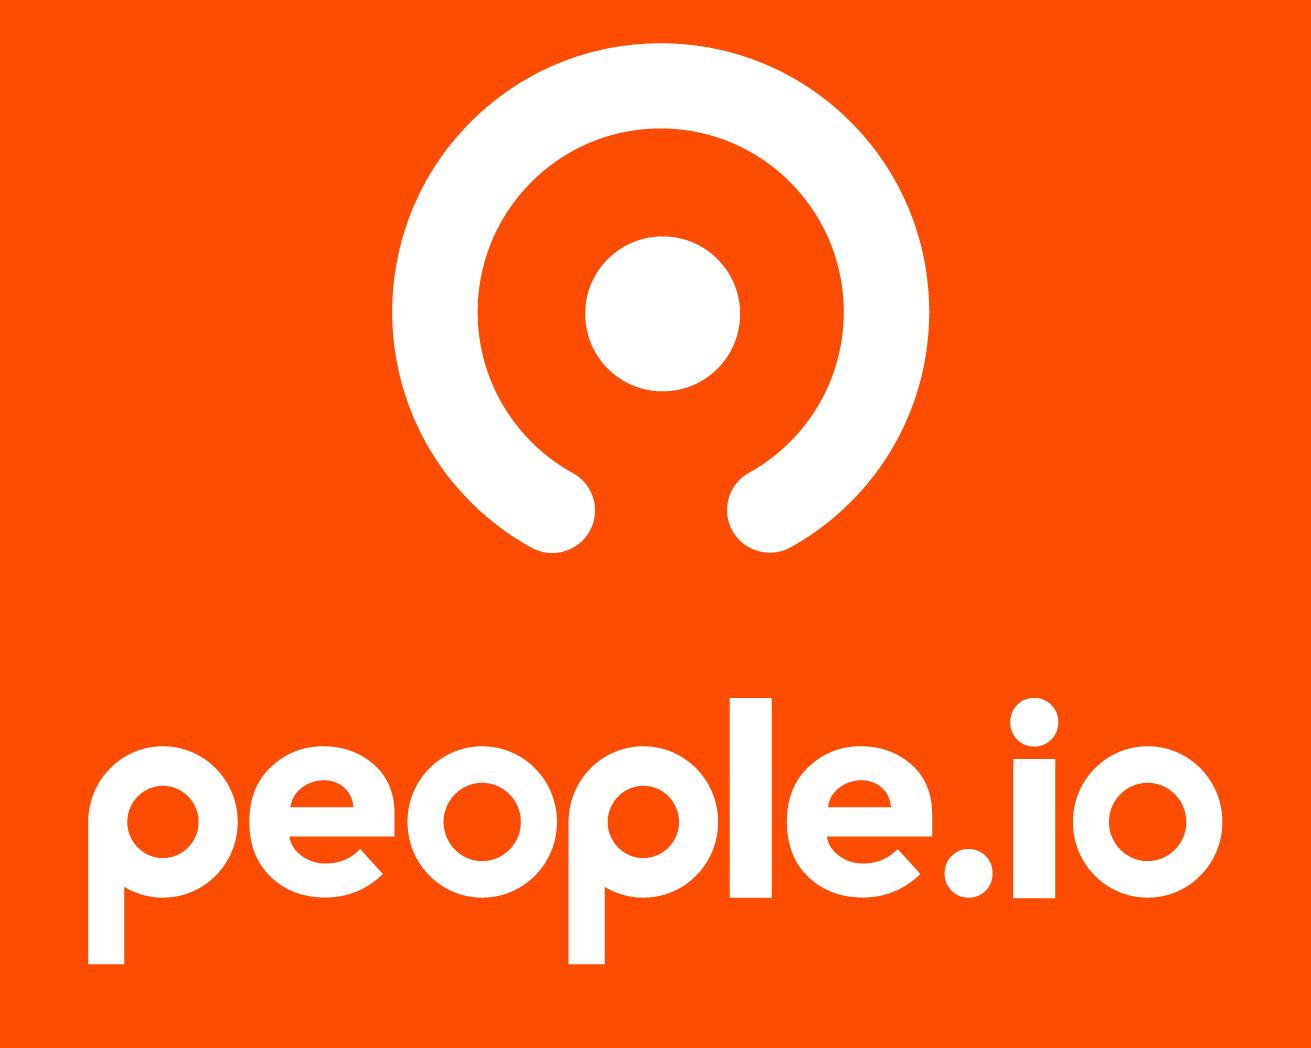 peopleio